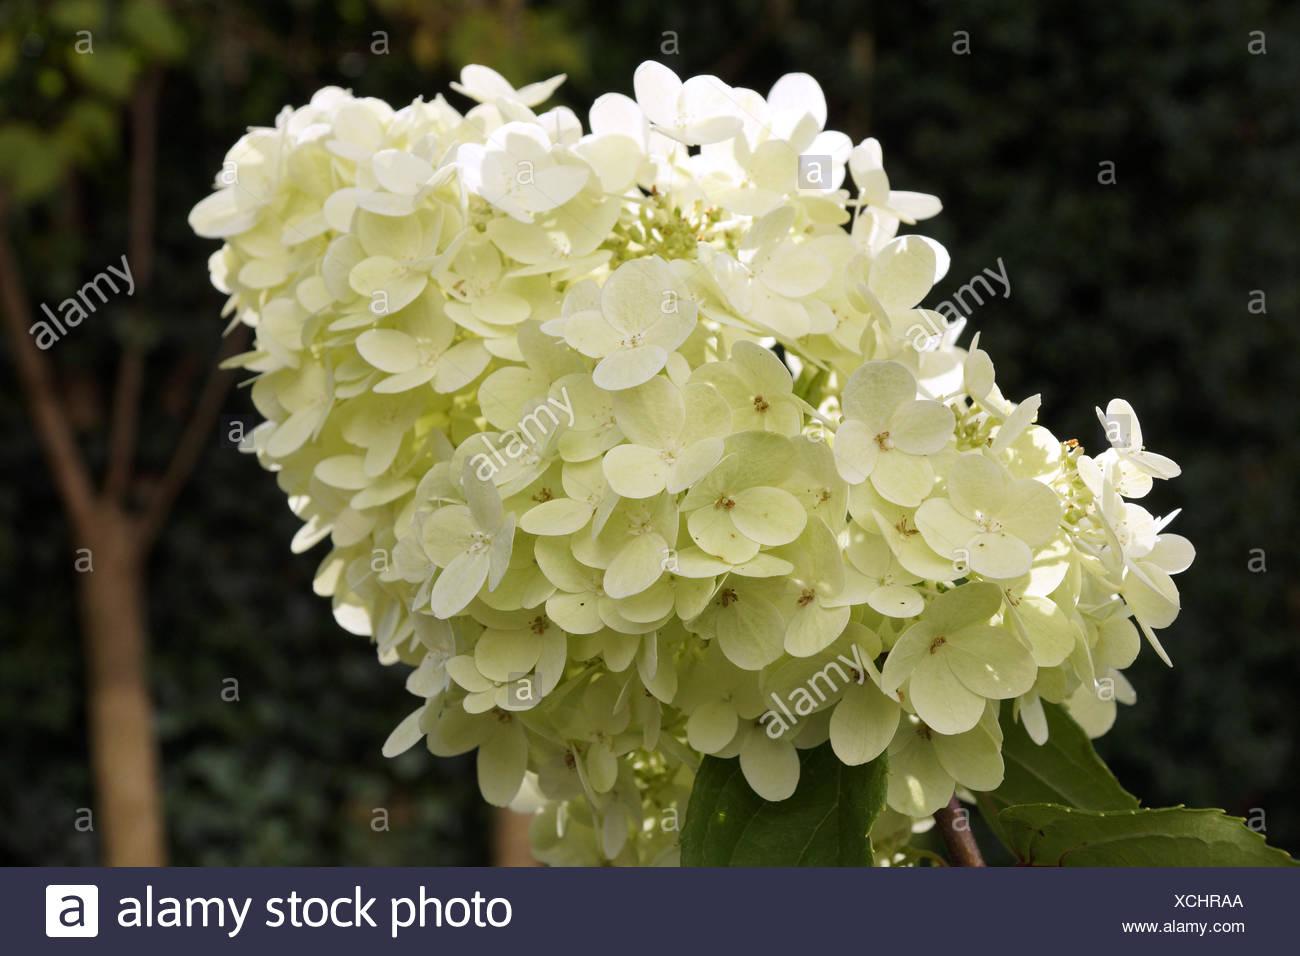 Verbena Bonariensis Vervain Perennials Limelight Hydrangea